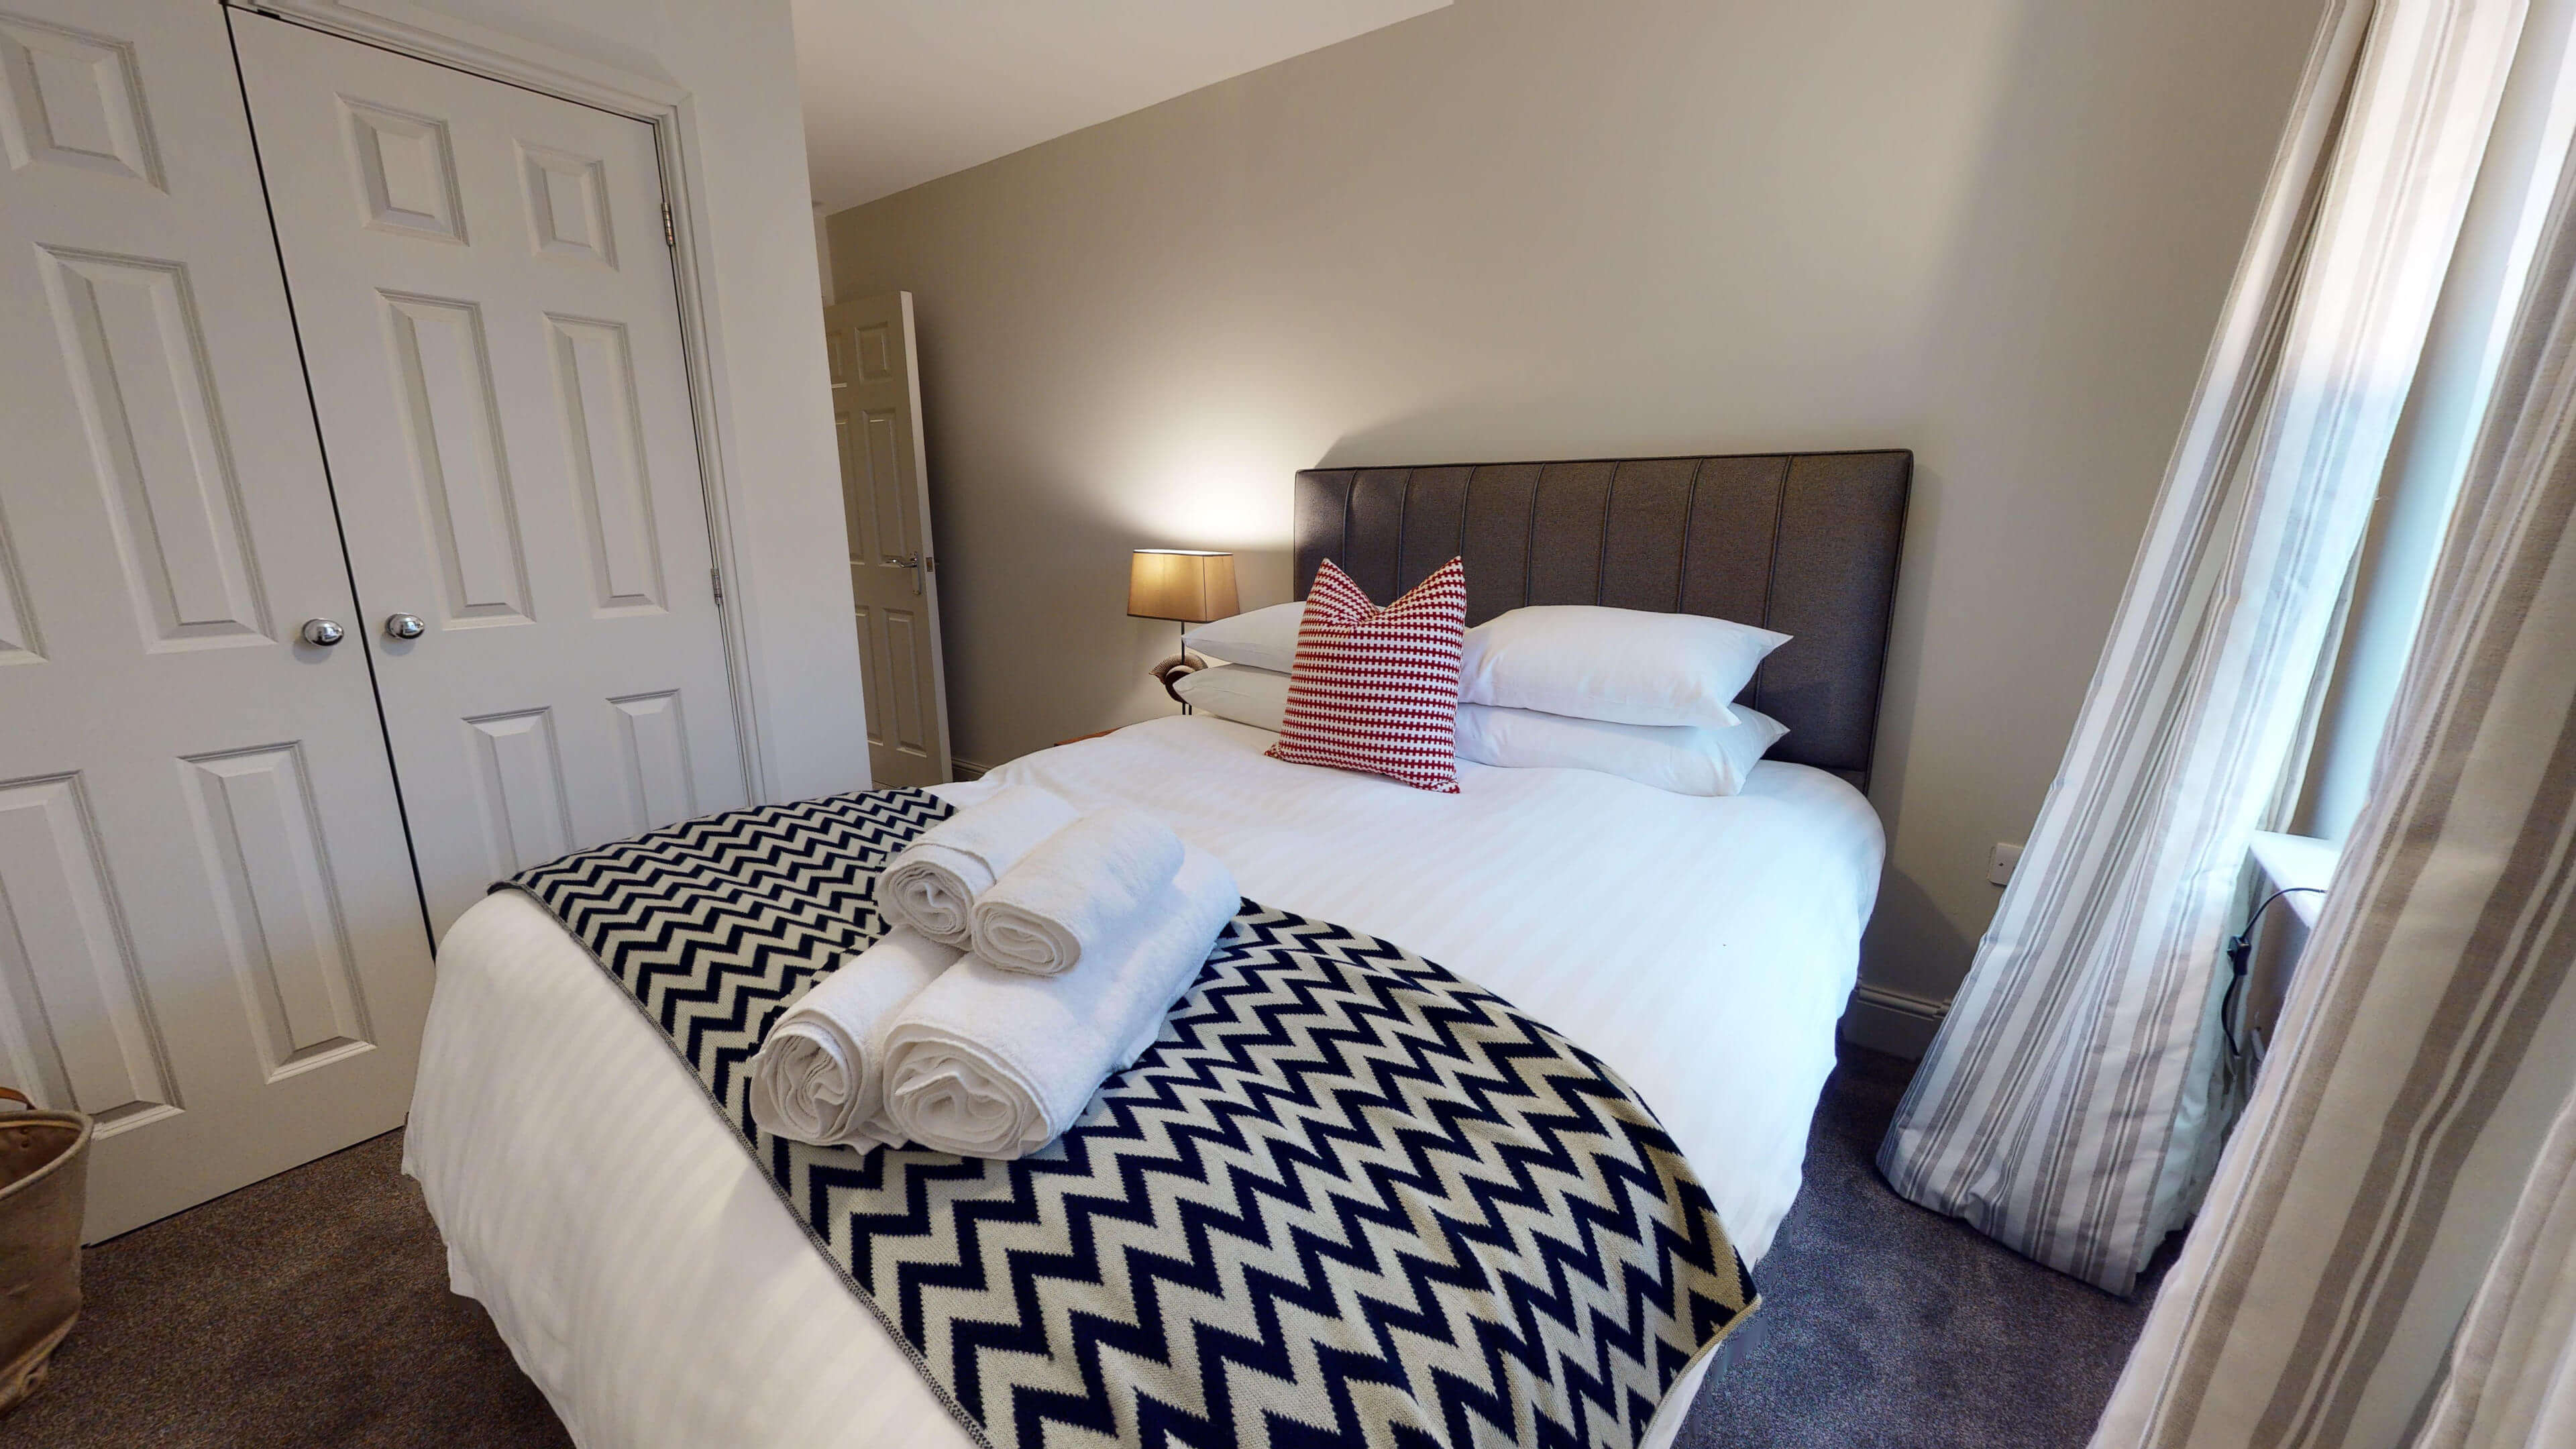 Oxford Serviced Apartment Blenheim Suite Bedroom Twojpg